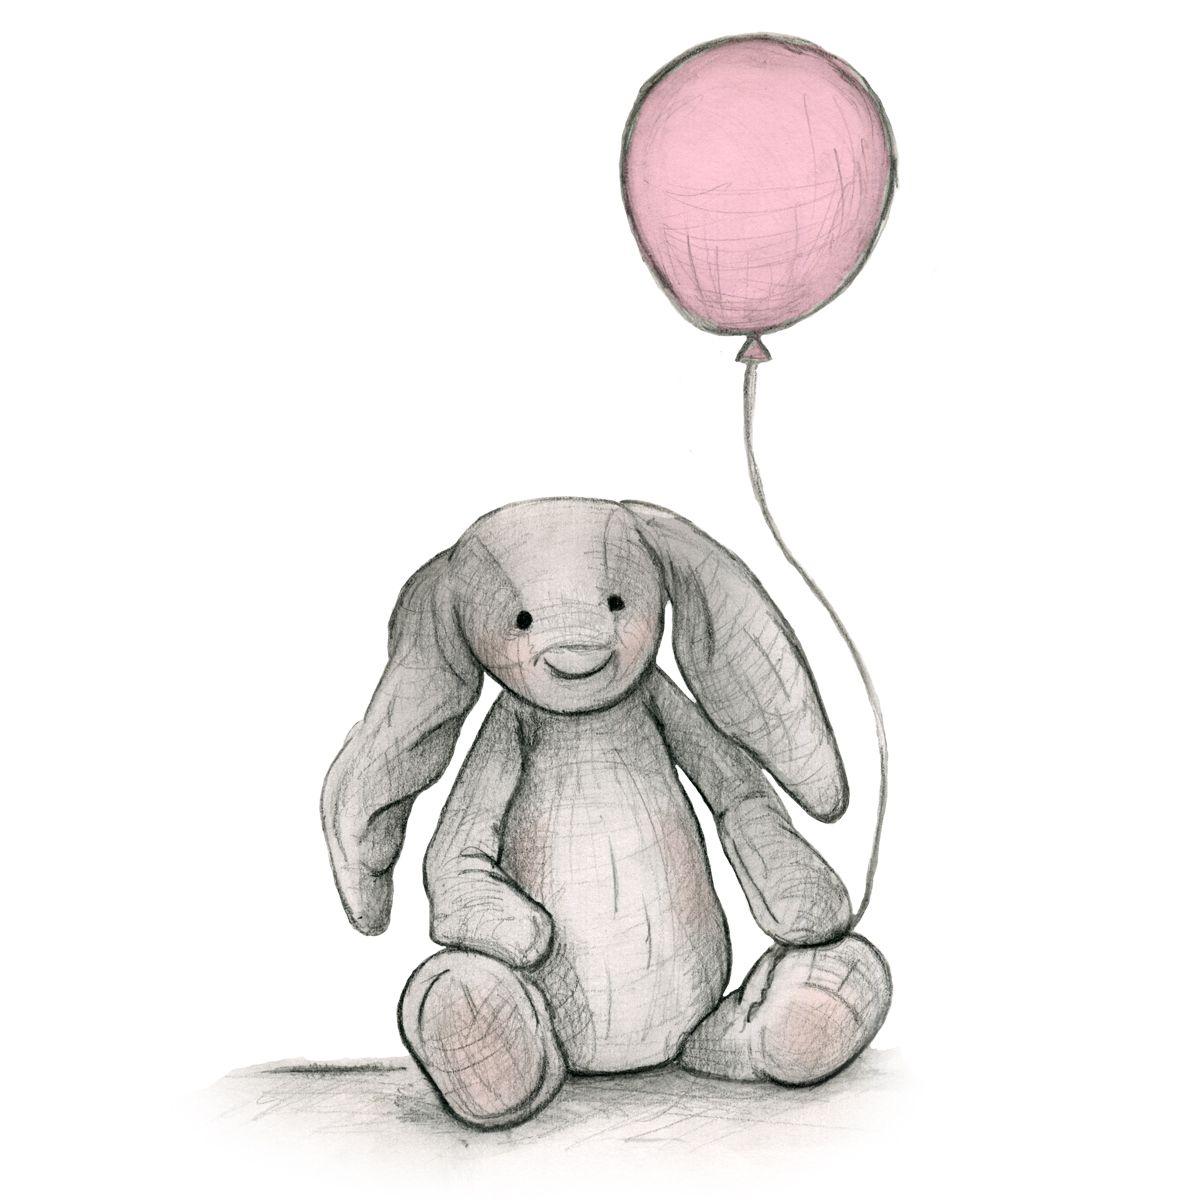 Bunny-Flying-Balloon-Girl-compressor